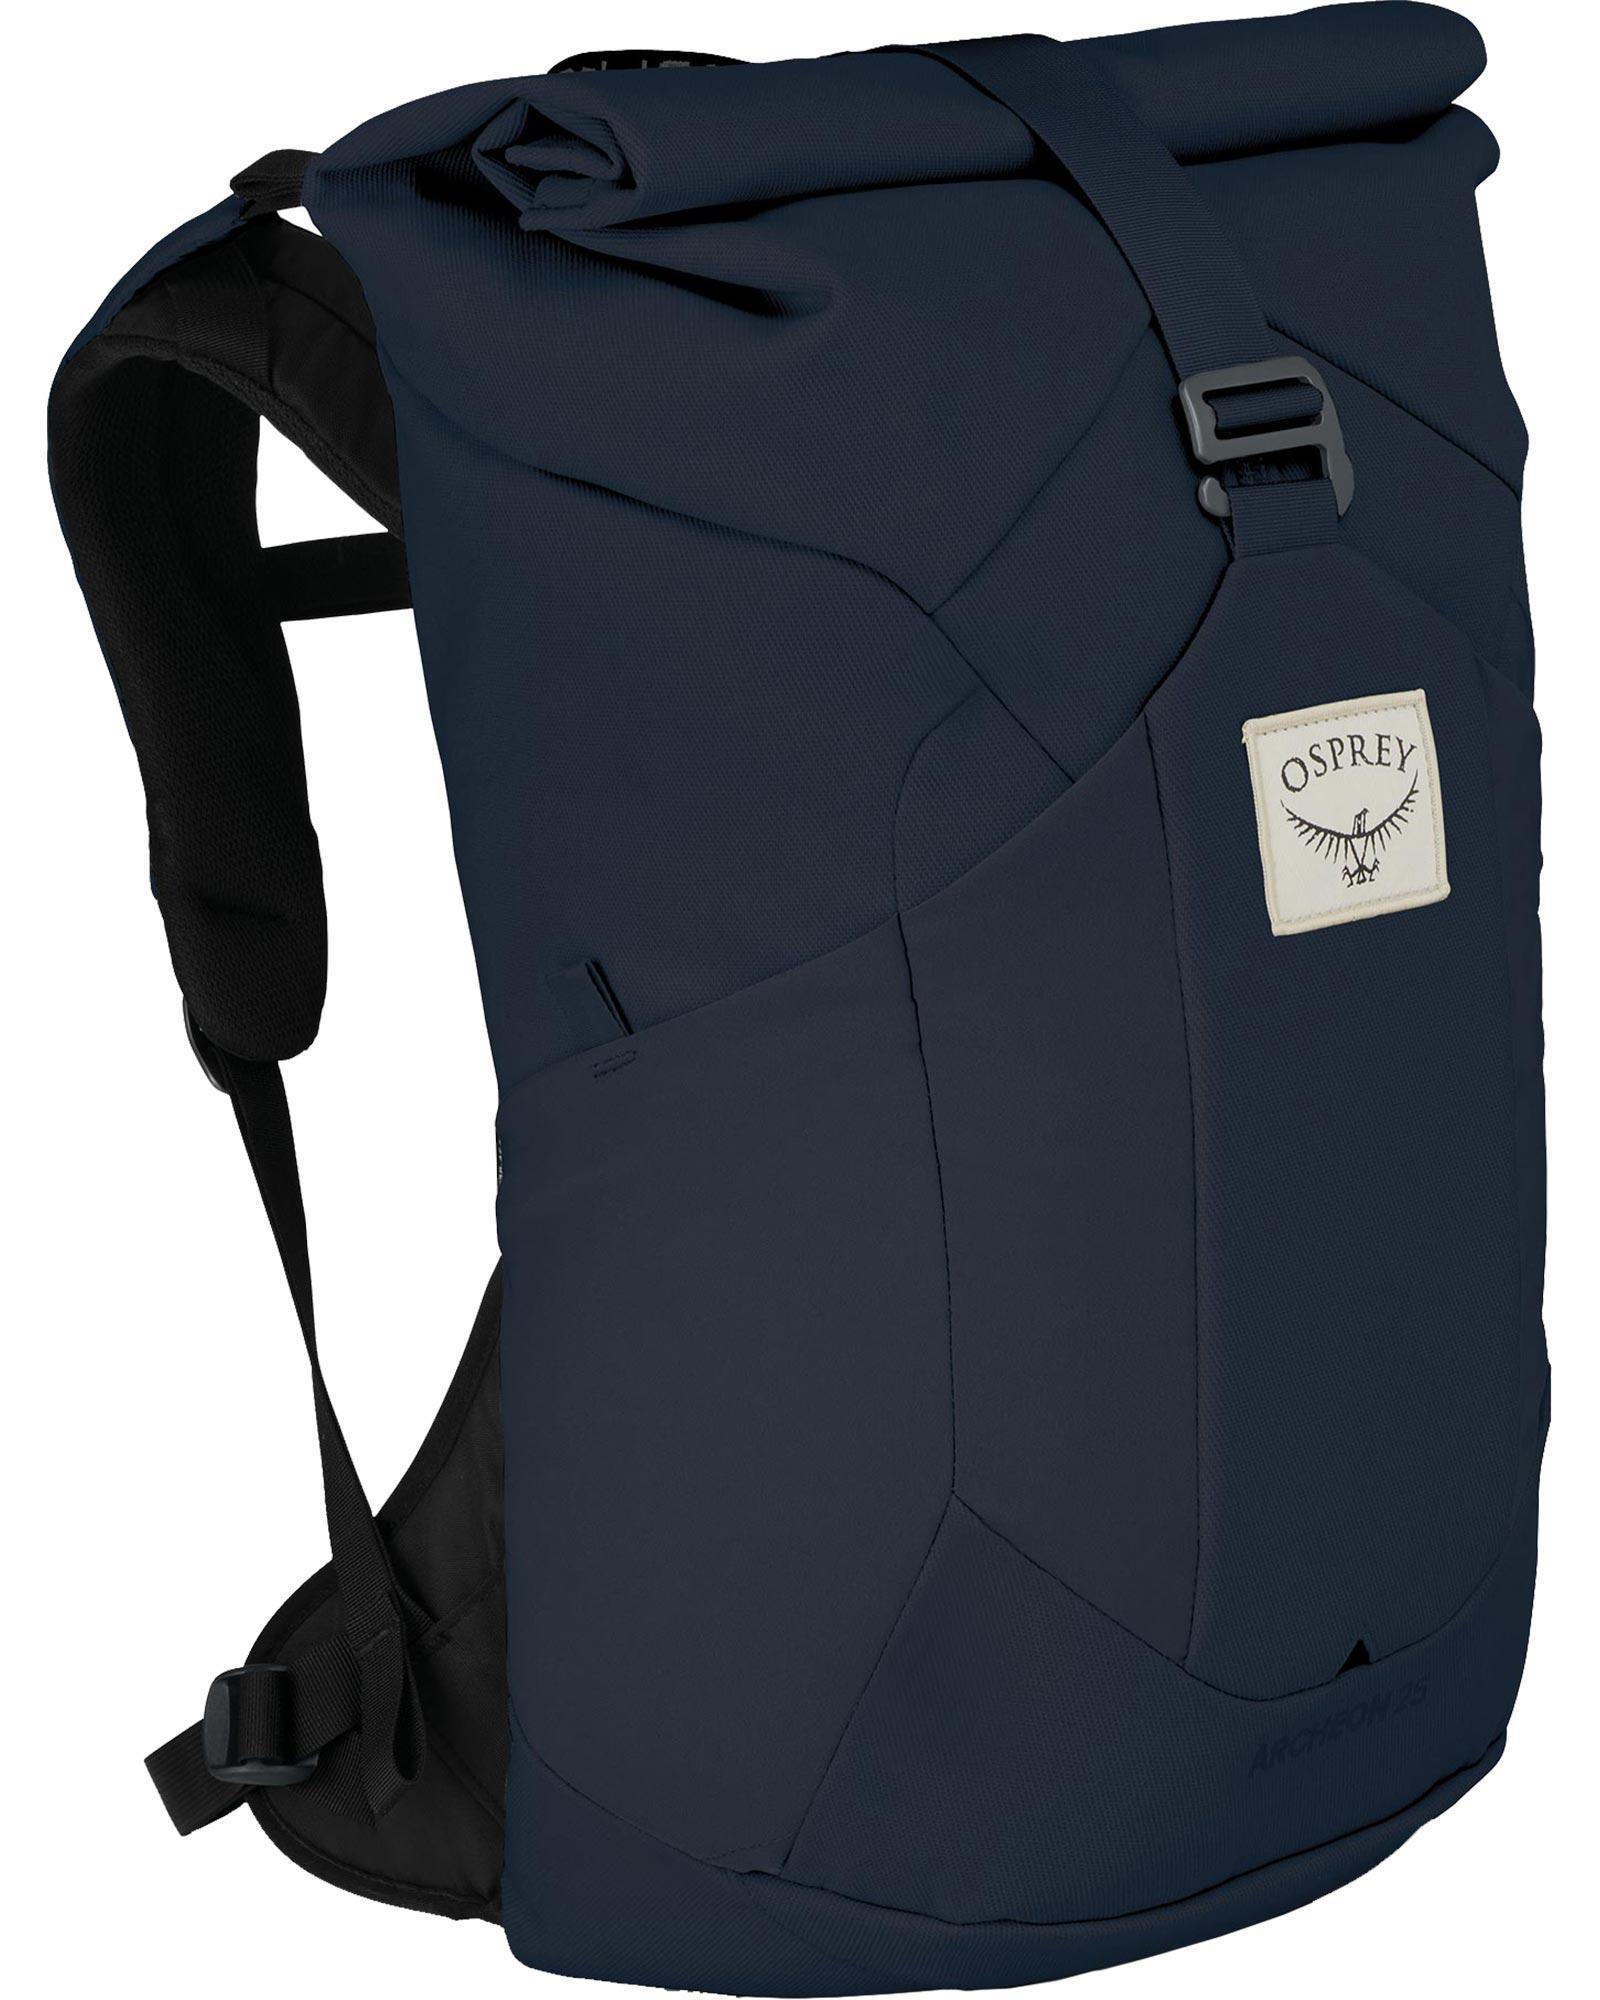 Osprey Women's Archeon 25 Backpack 0